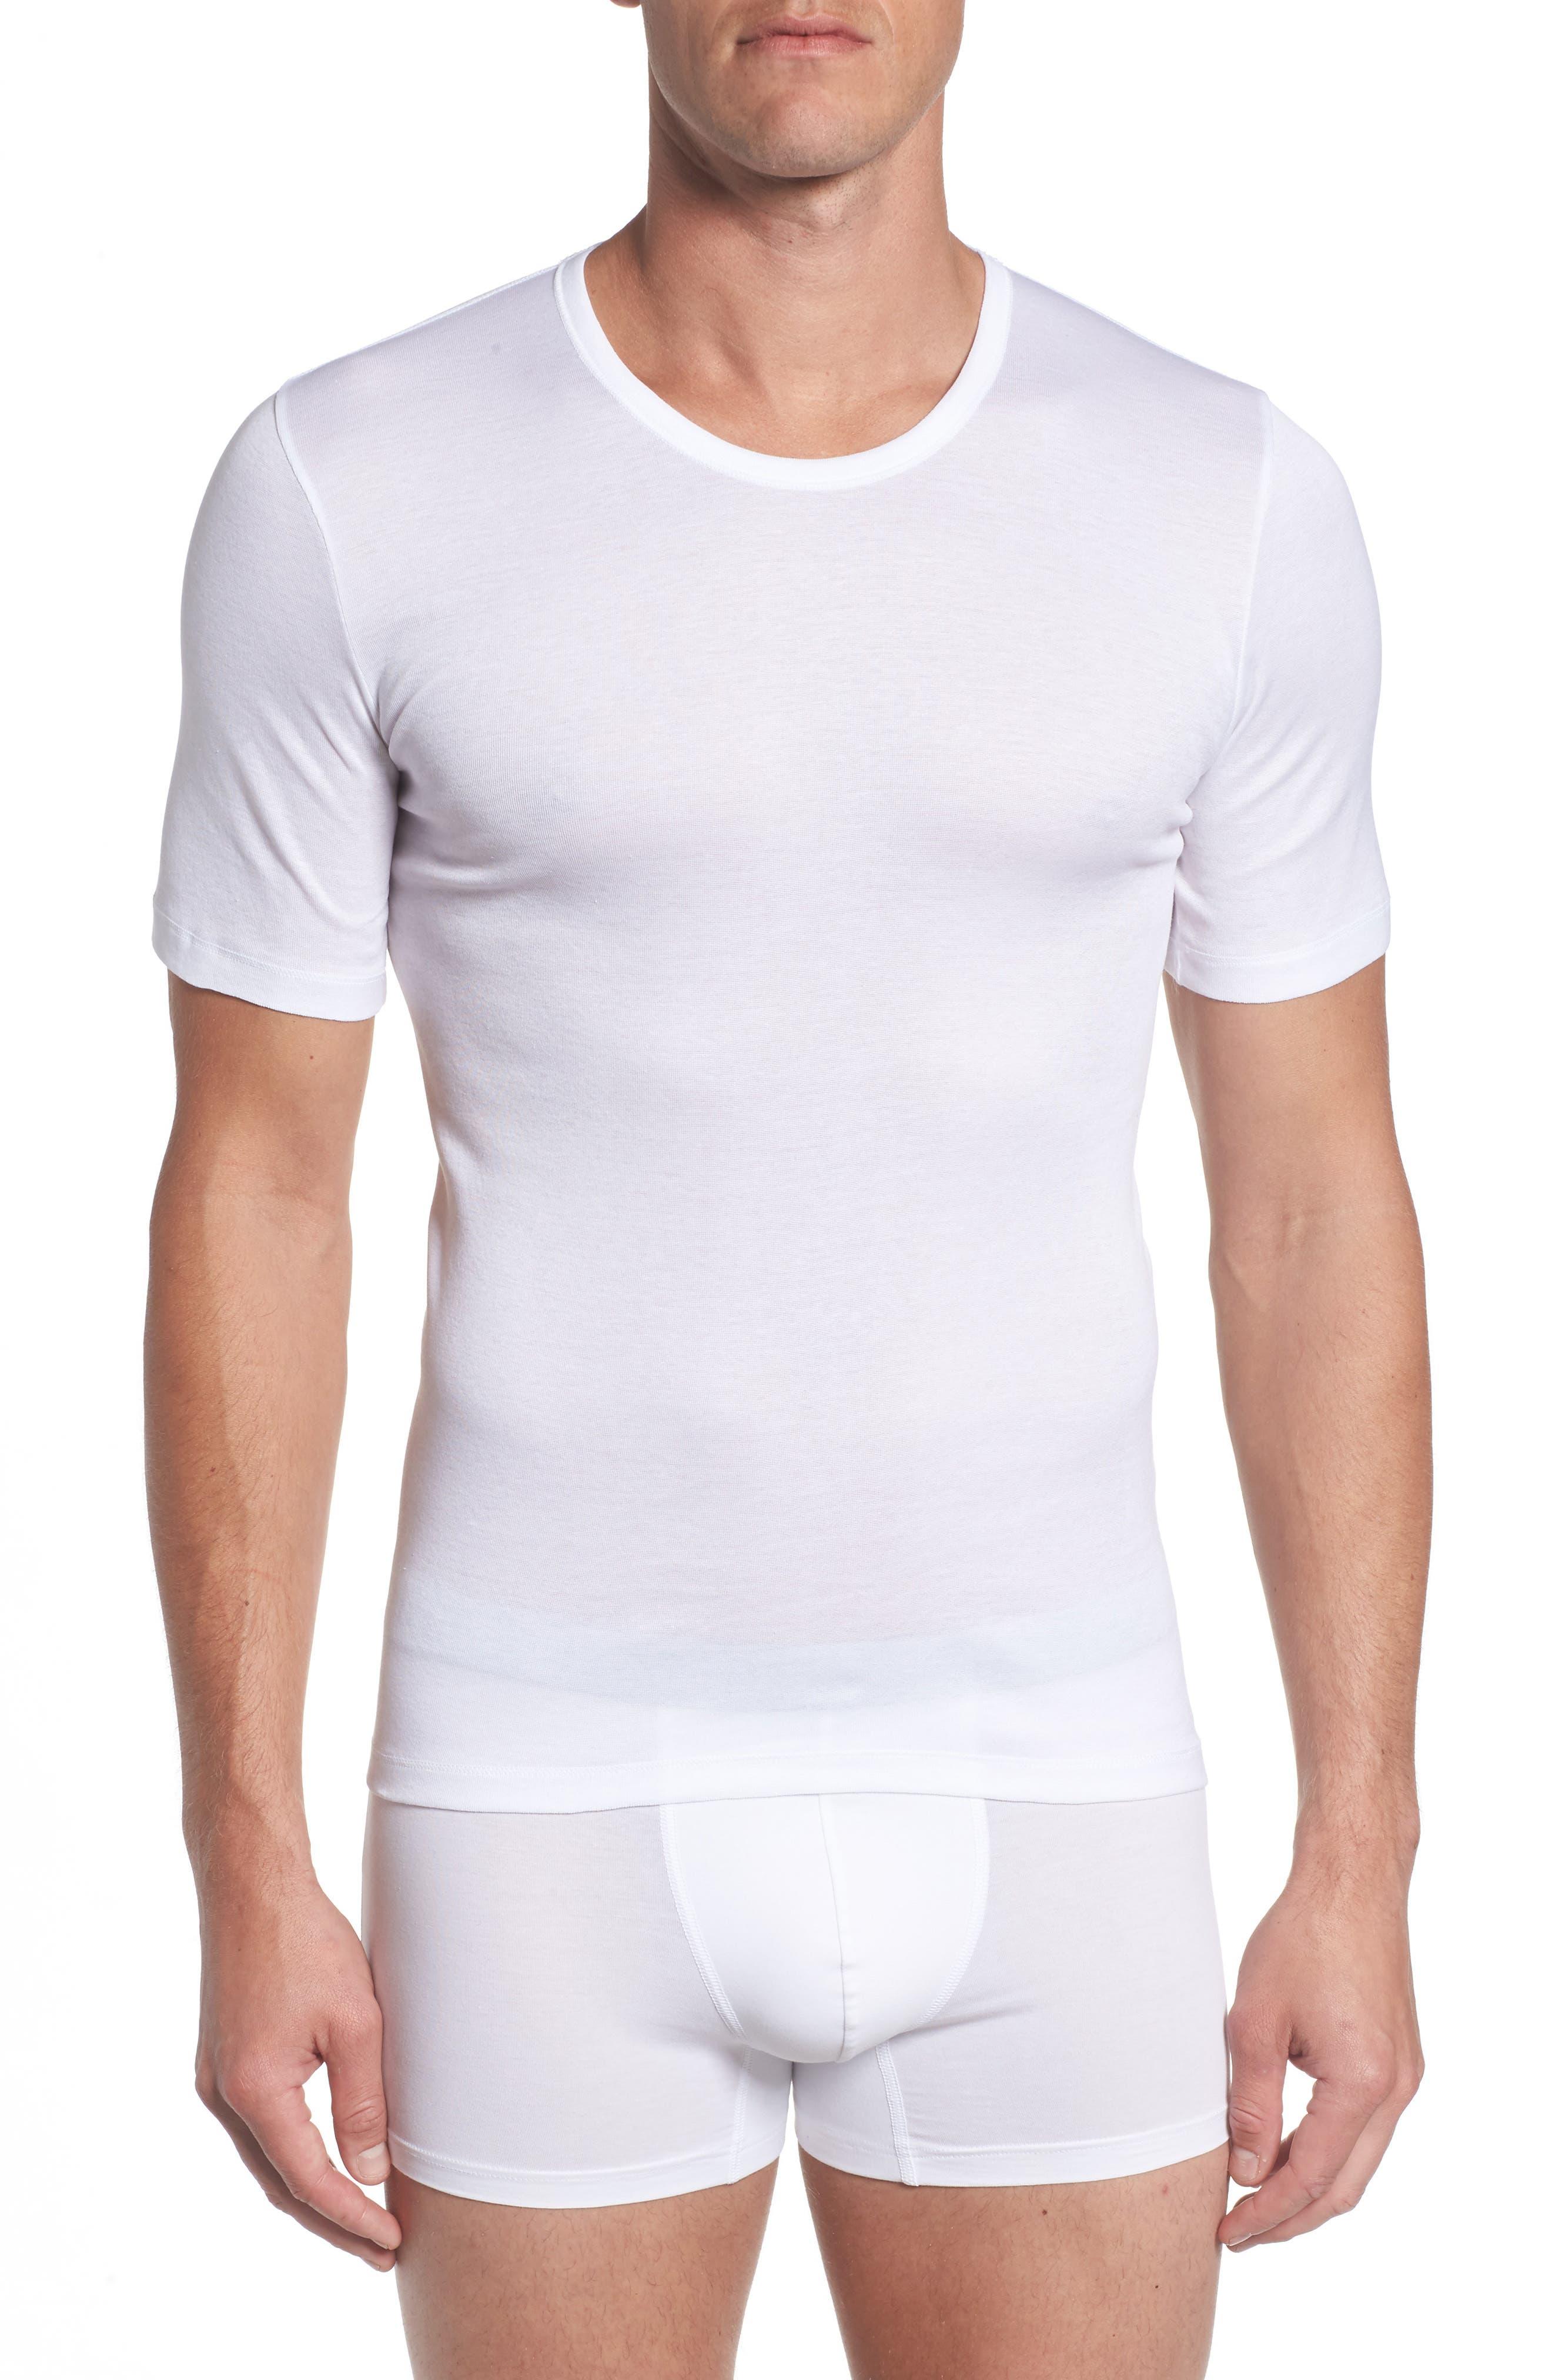 Alternate Image 1 Selected - Hanro Cotton Pure Crewneck T-Shirt